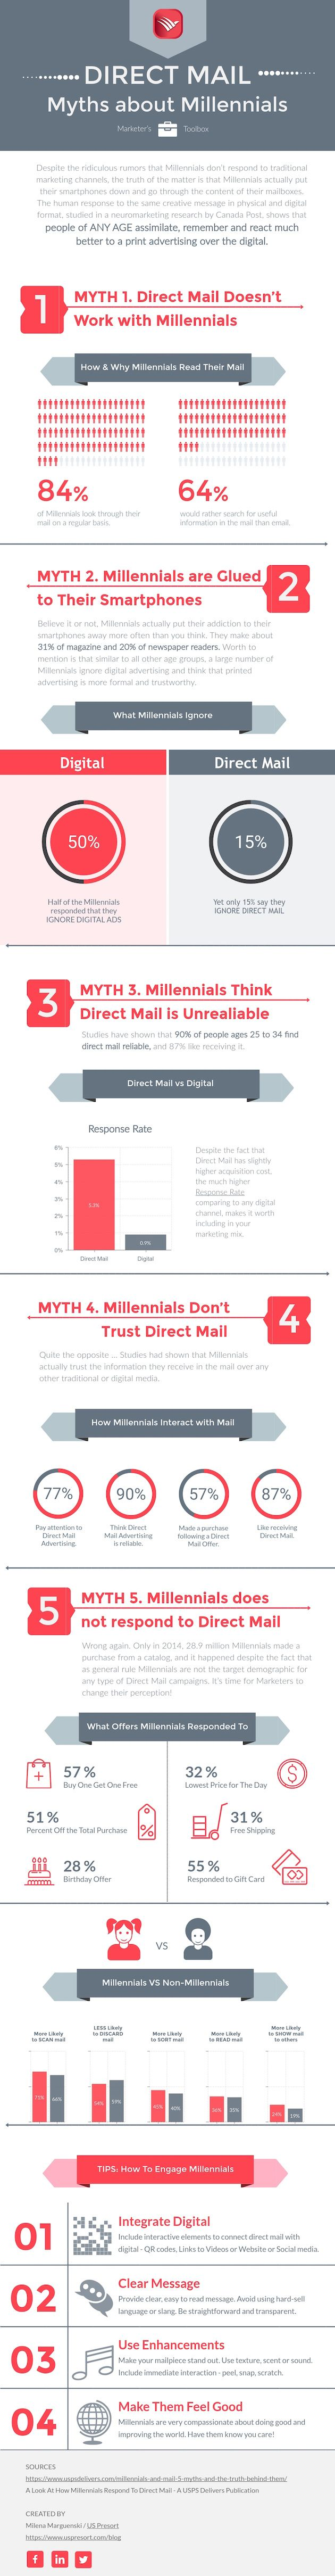 Millennials and Direct Mail